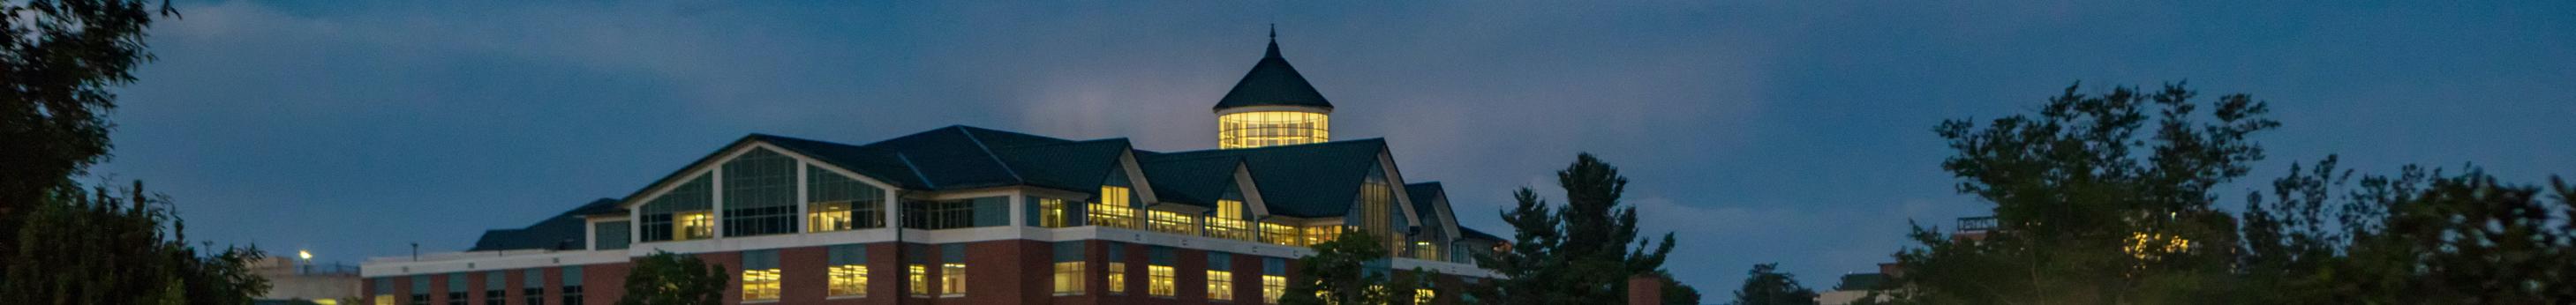 Belk Library at night